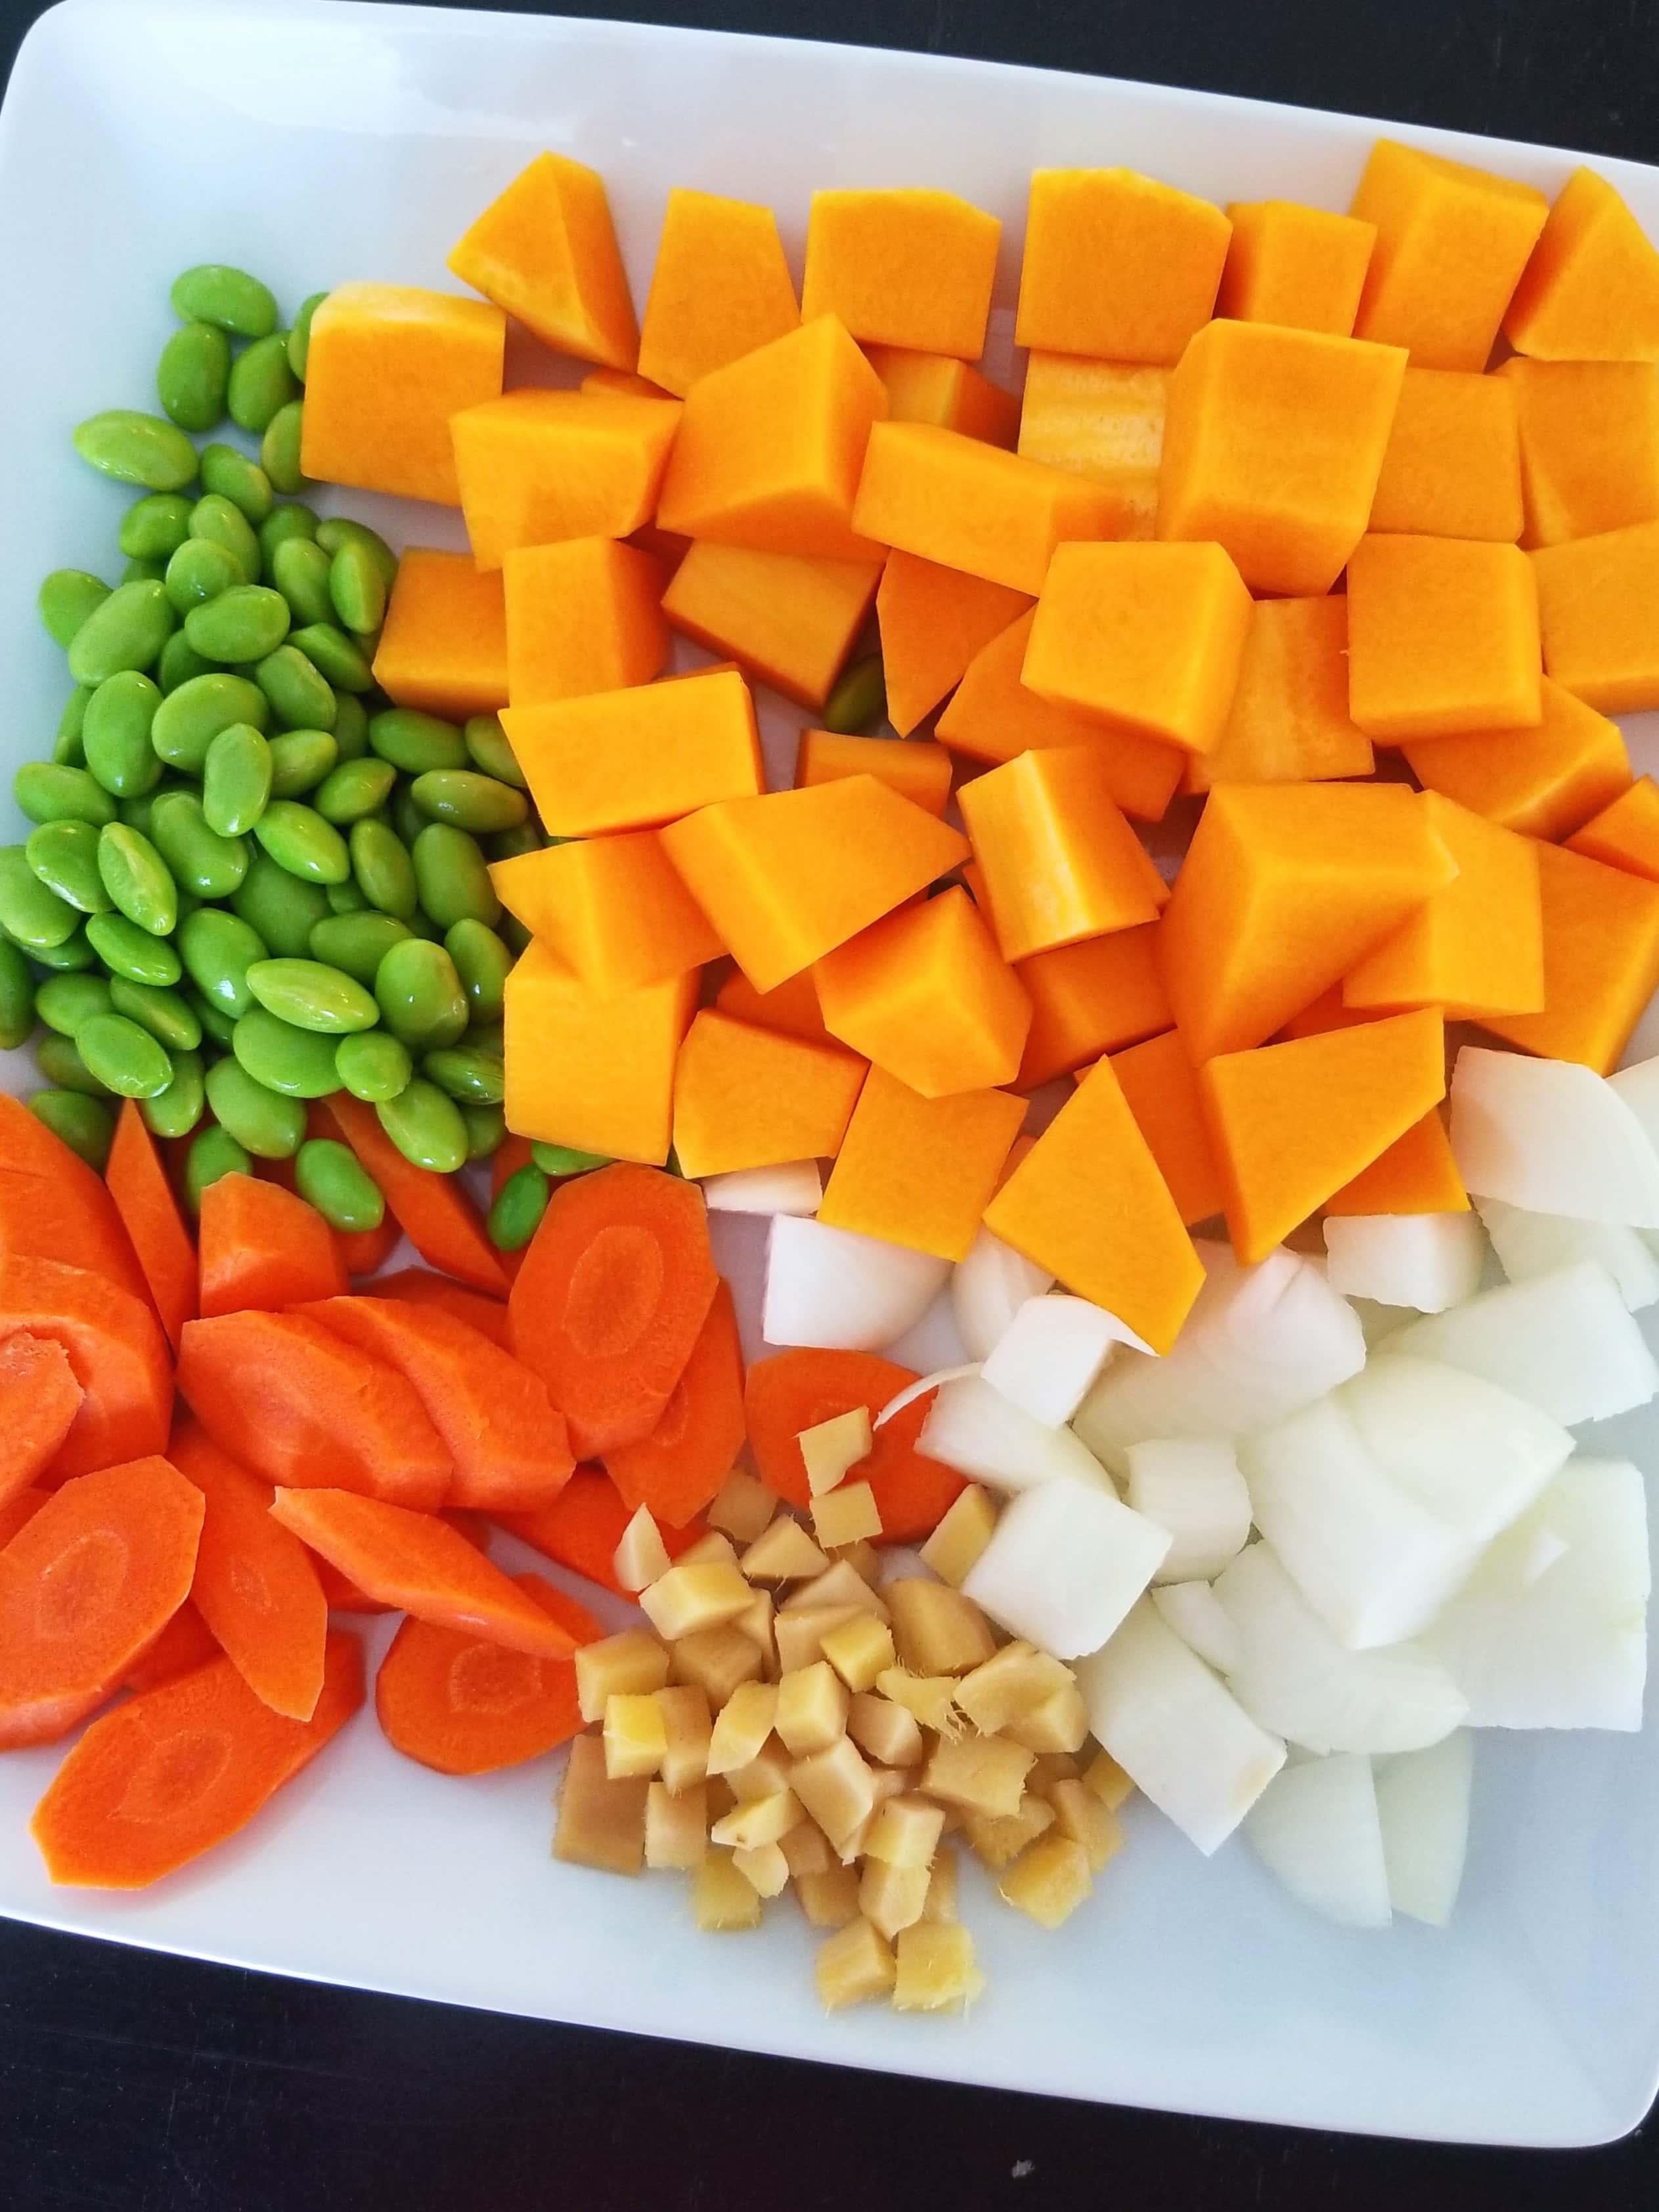 Butter squash, onion, ginger, carrots, edamame